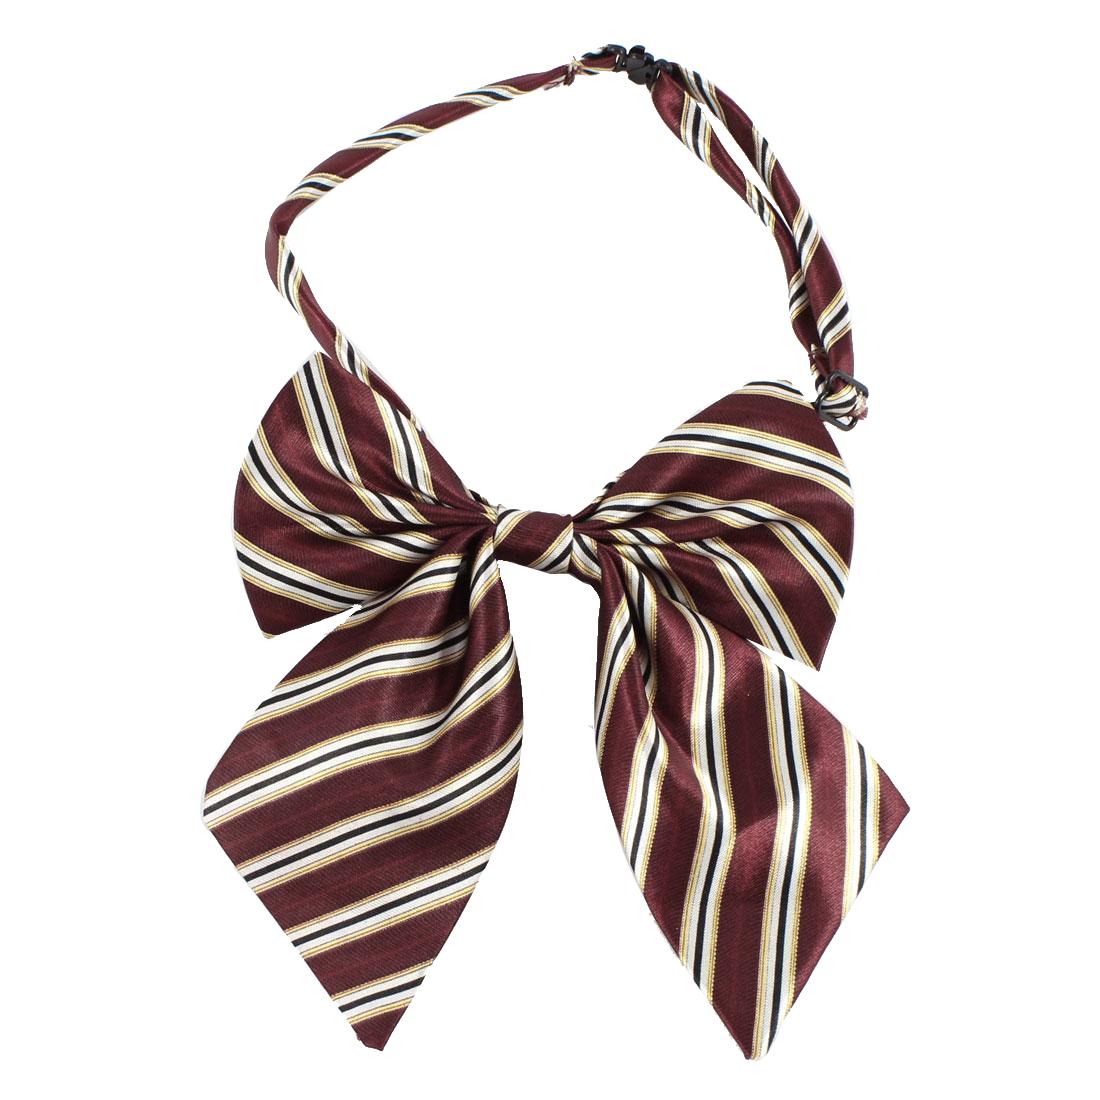 Women Girls Stripe Bowknot Decor Adjustable Bow Tie Clip Necktie